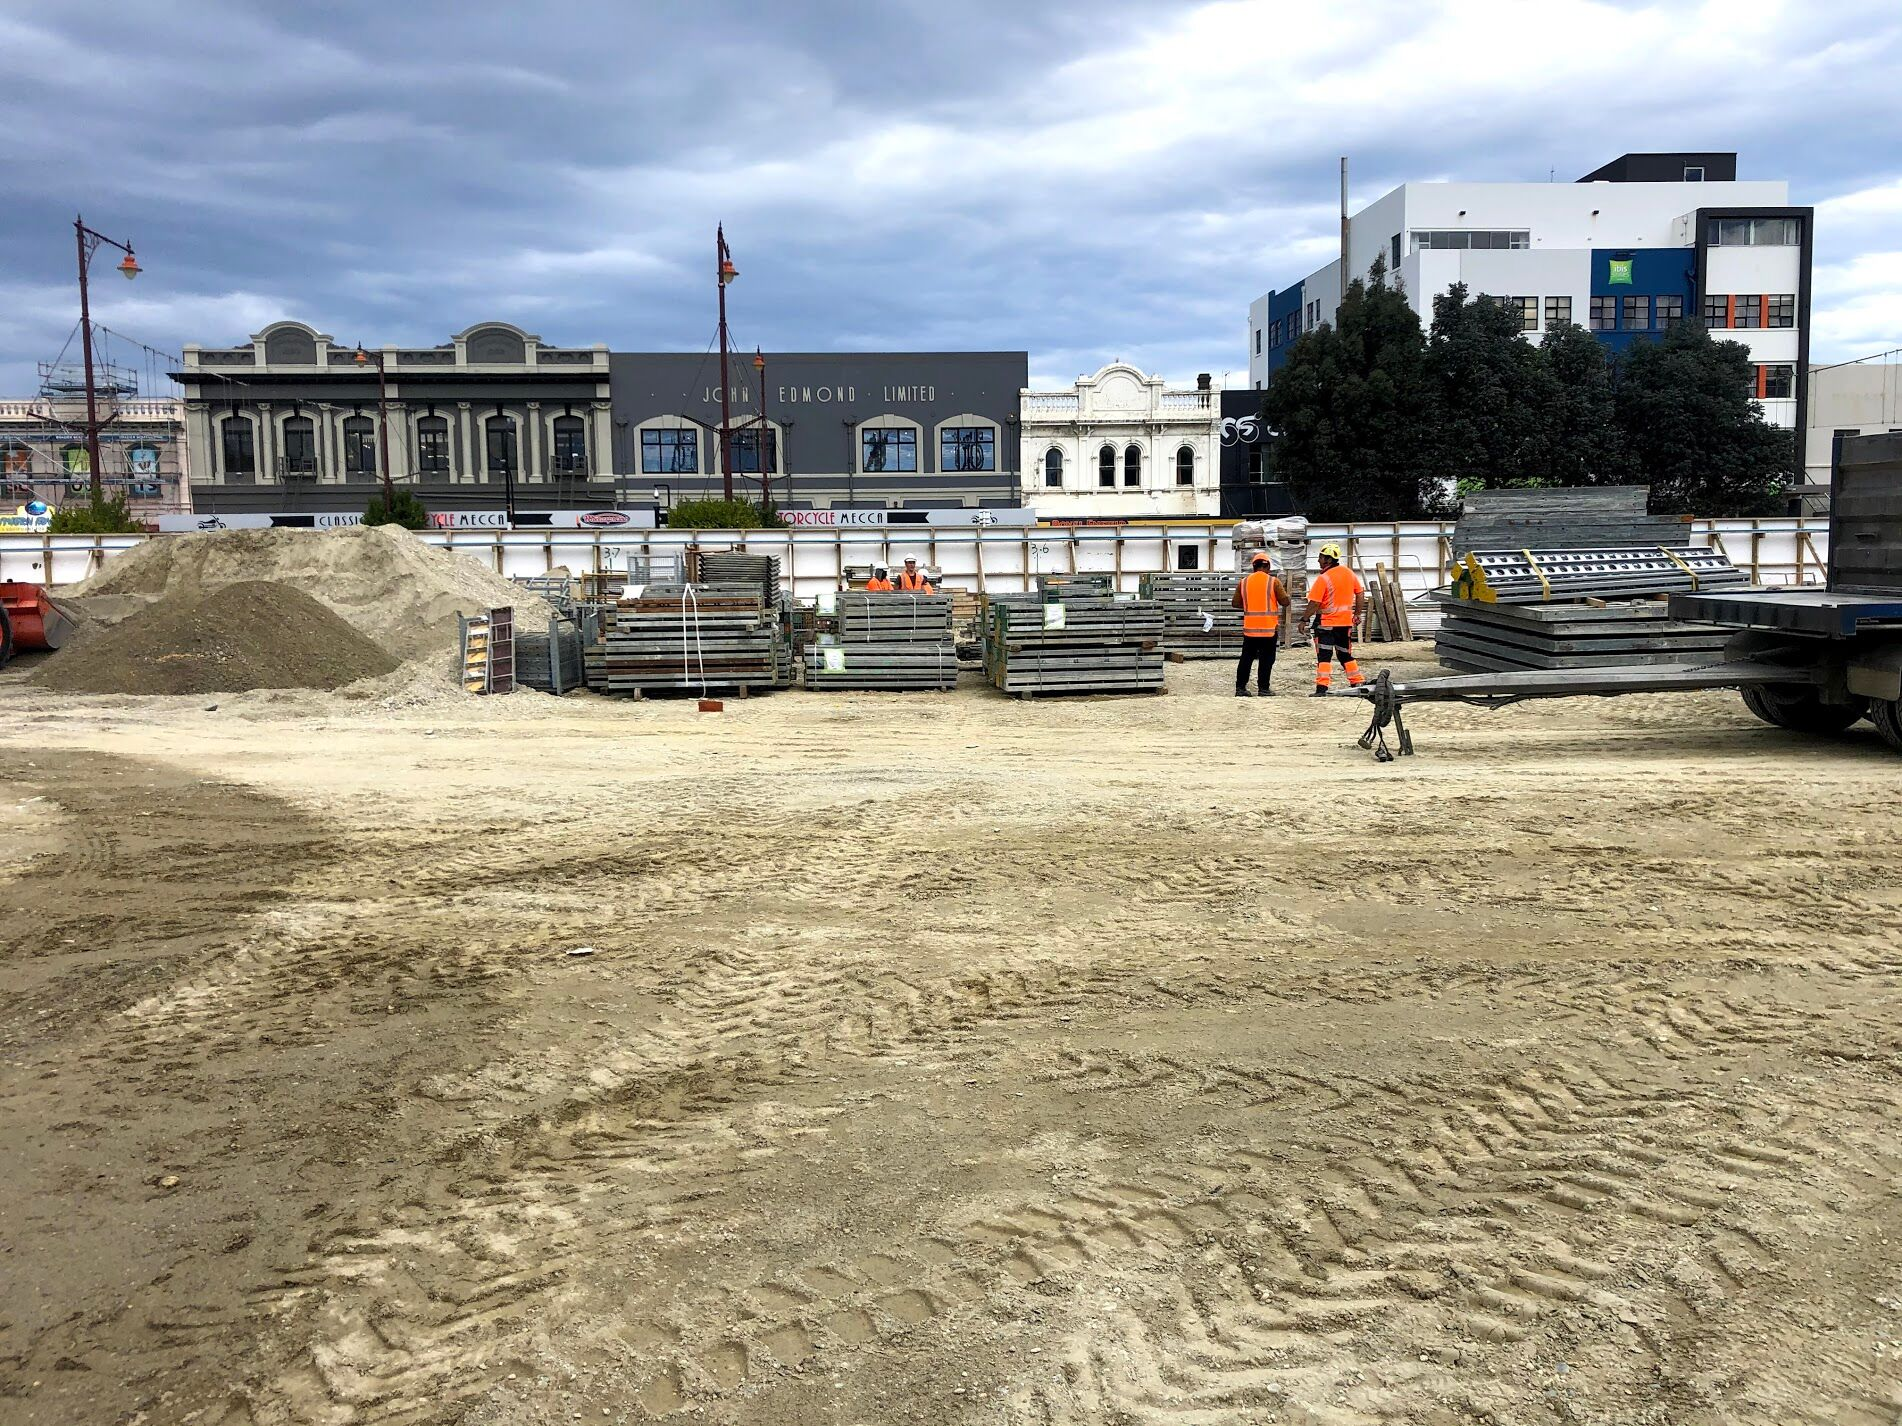 Invercargill city centre under construction